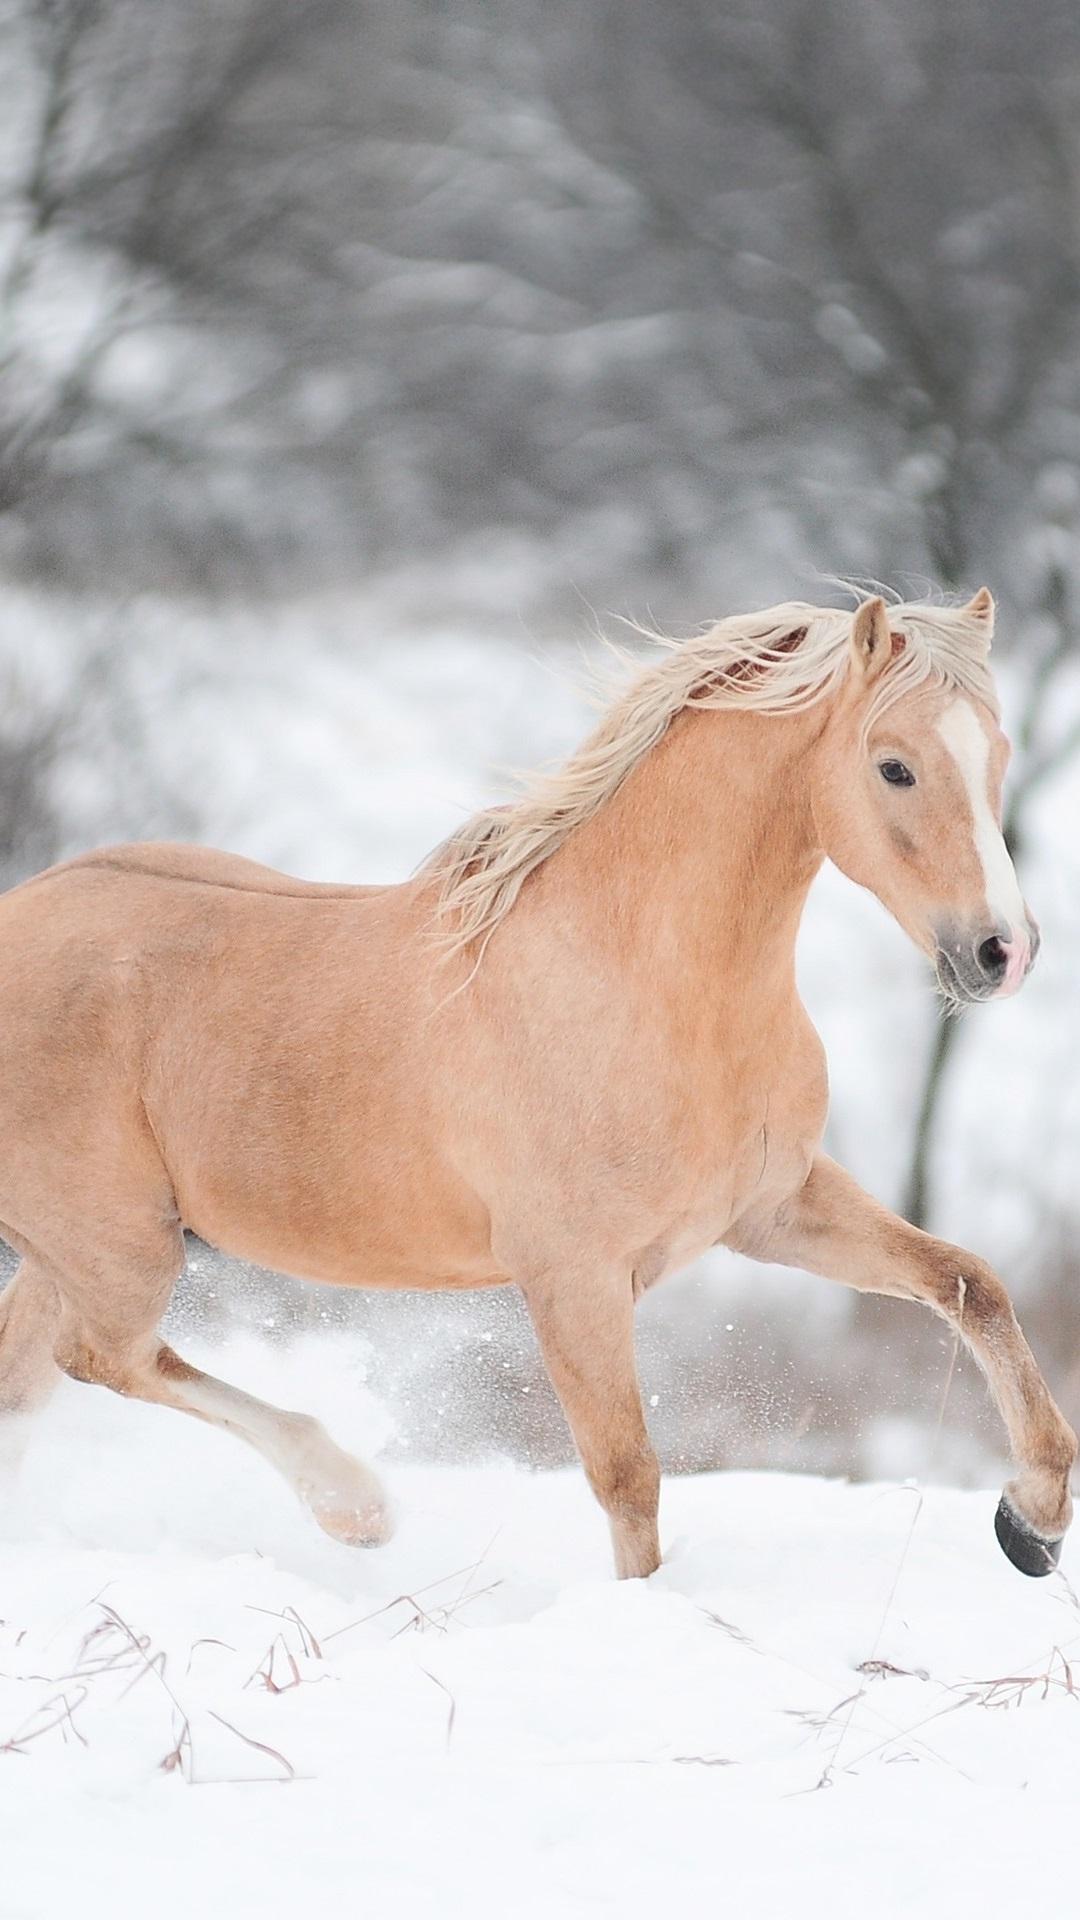 Iphone Wallpaper Horse Running In Winter Caballos Corriendo En La Nieve 1080x1920 Wallpaper Teahub Io